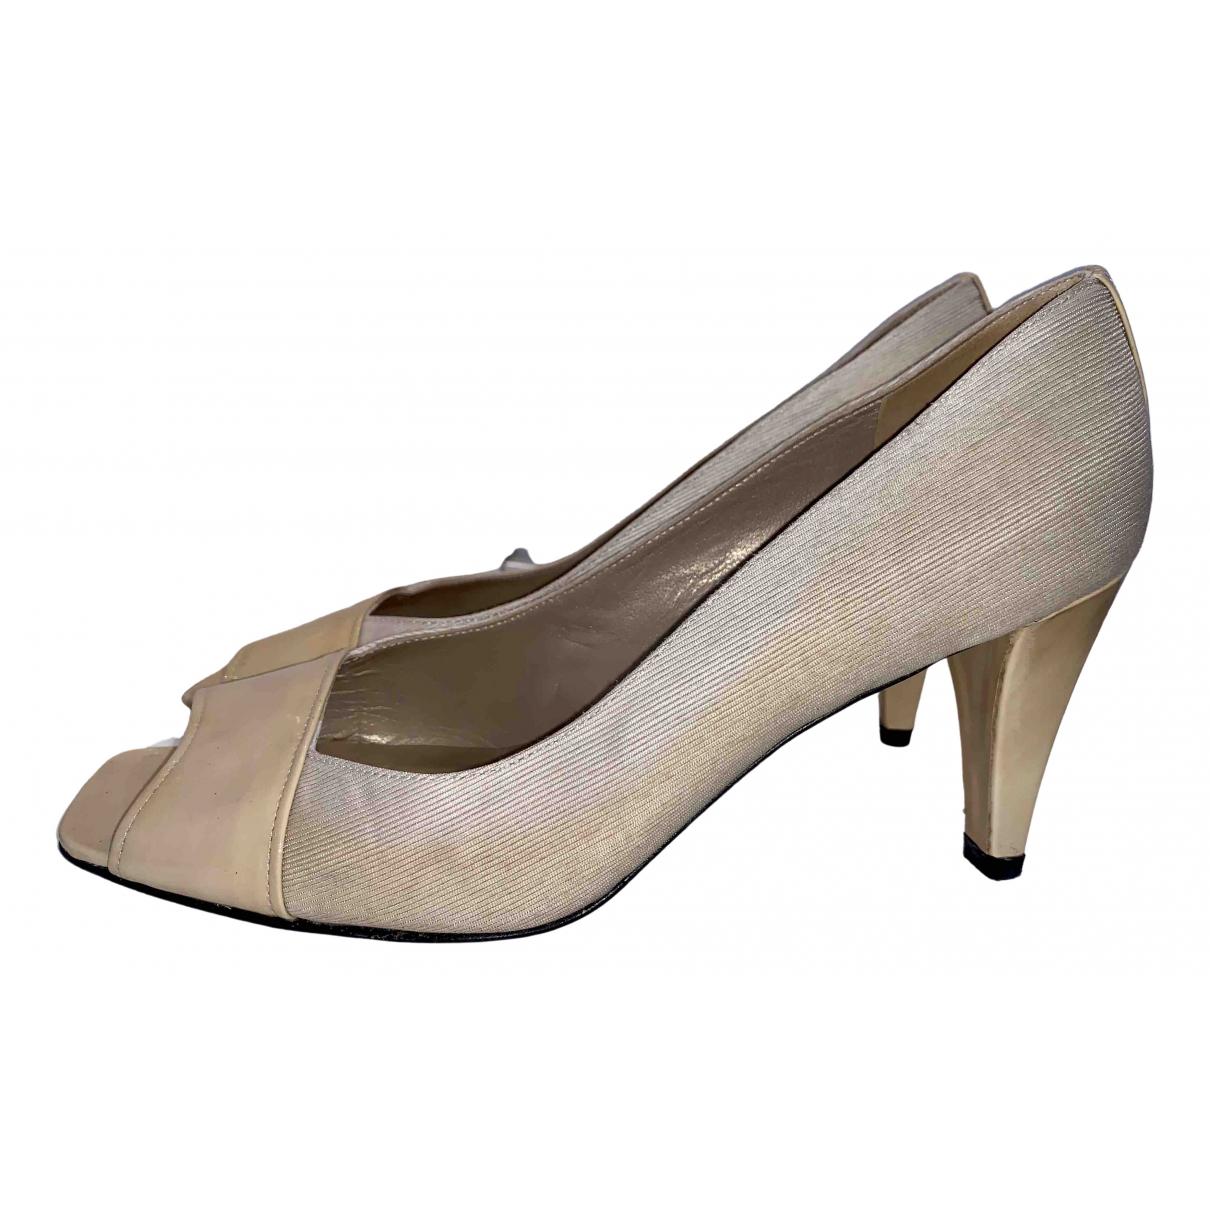 Stuart Weitzman \N Beige Leather Heels for Women 39.5 EU